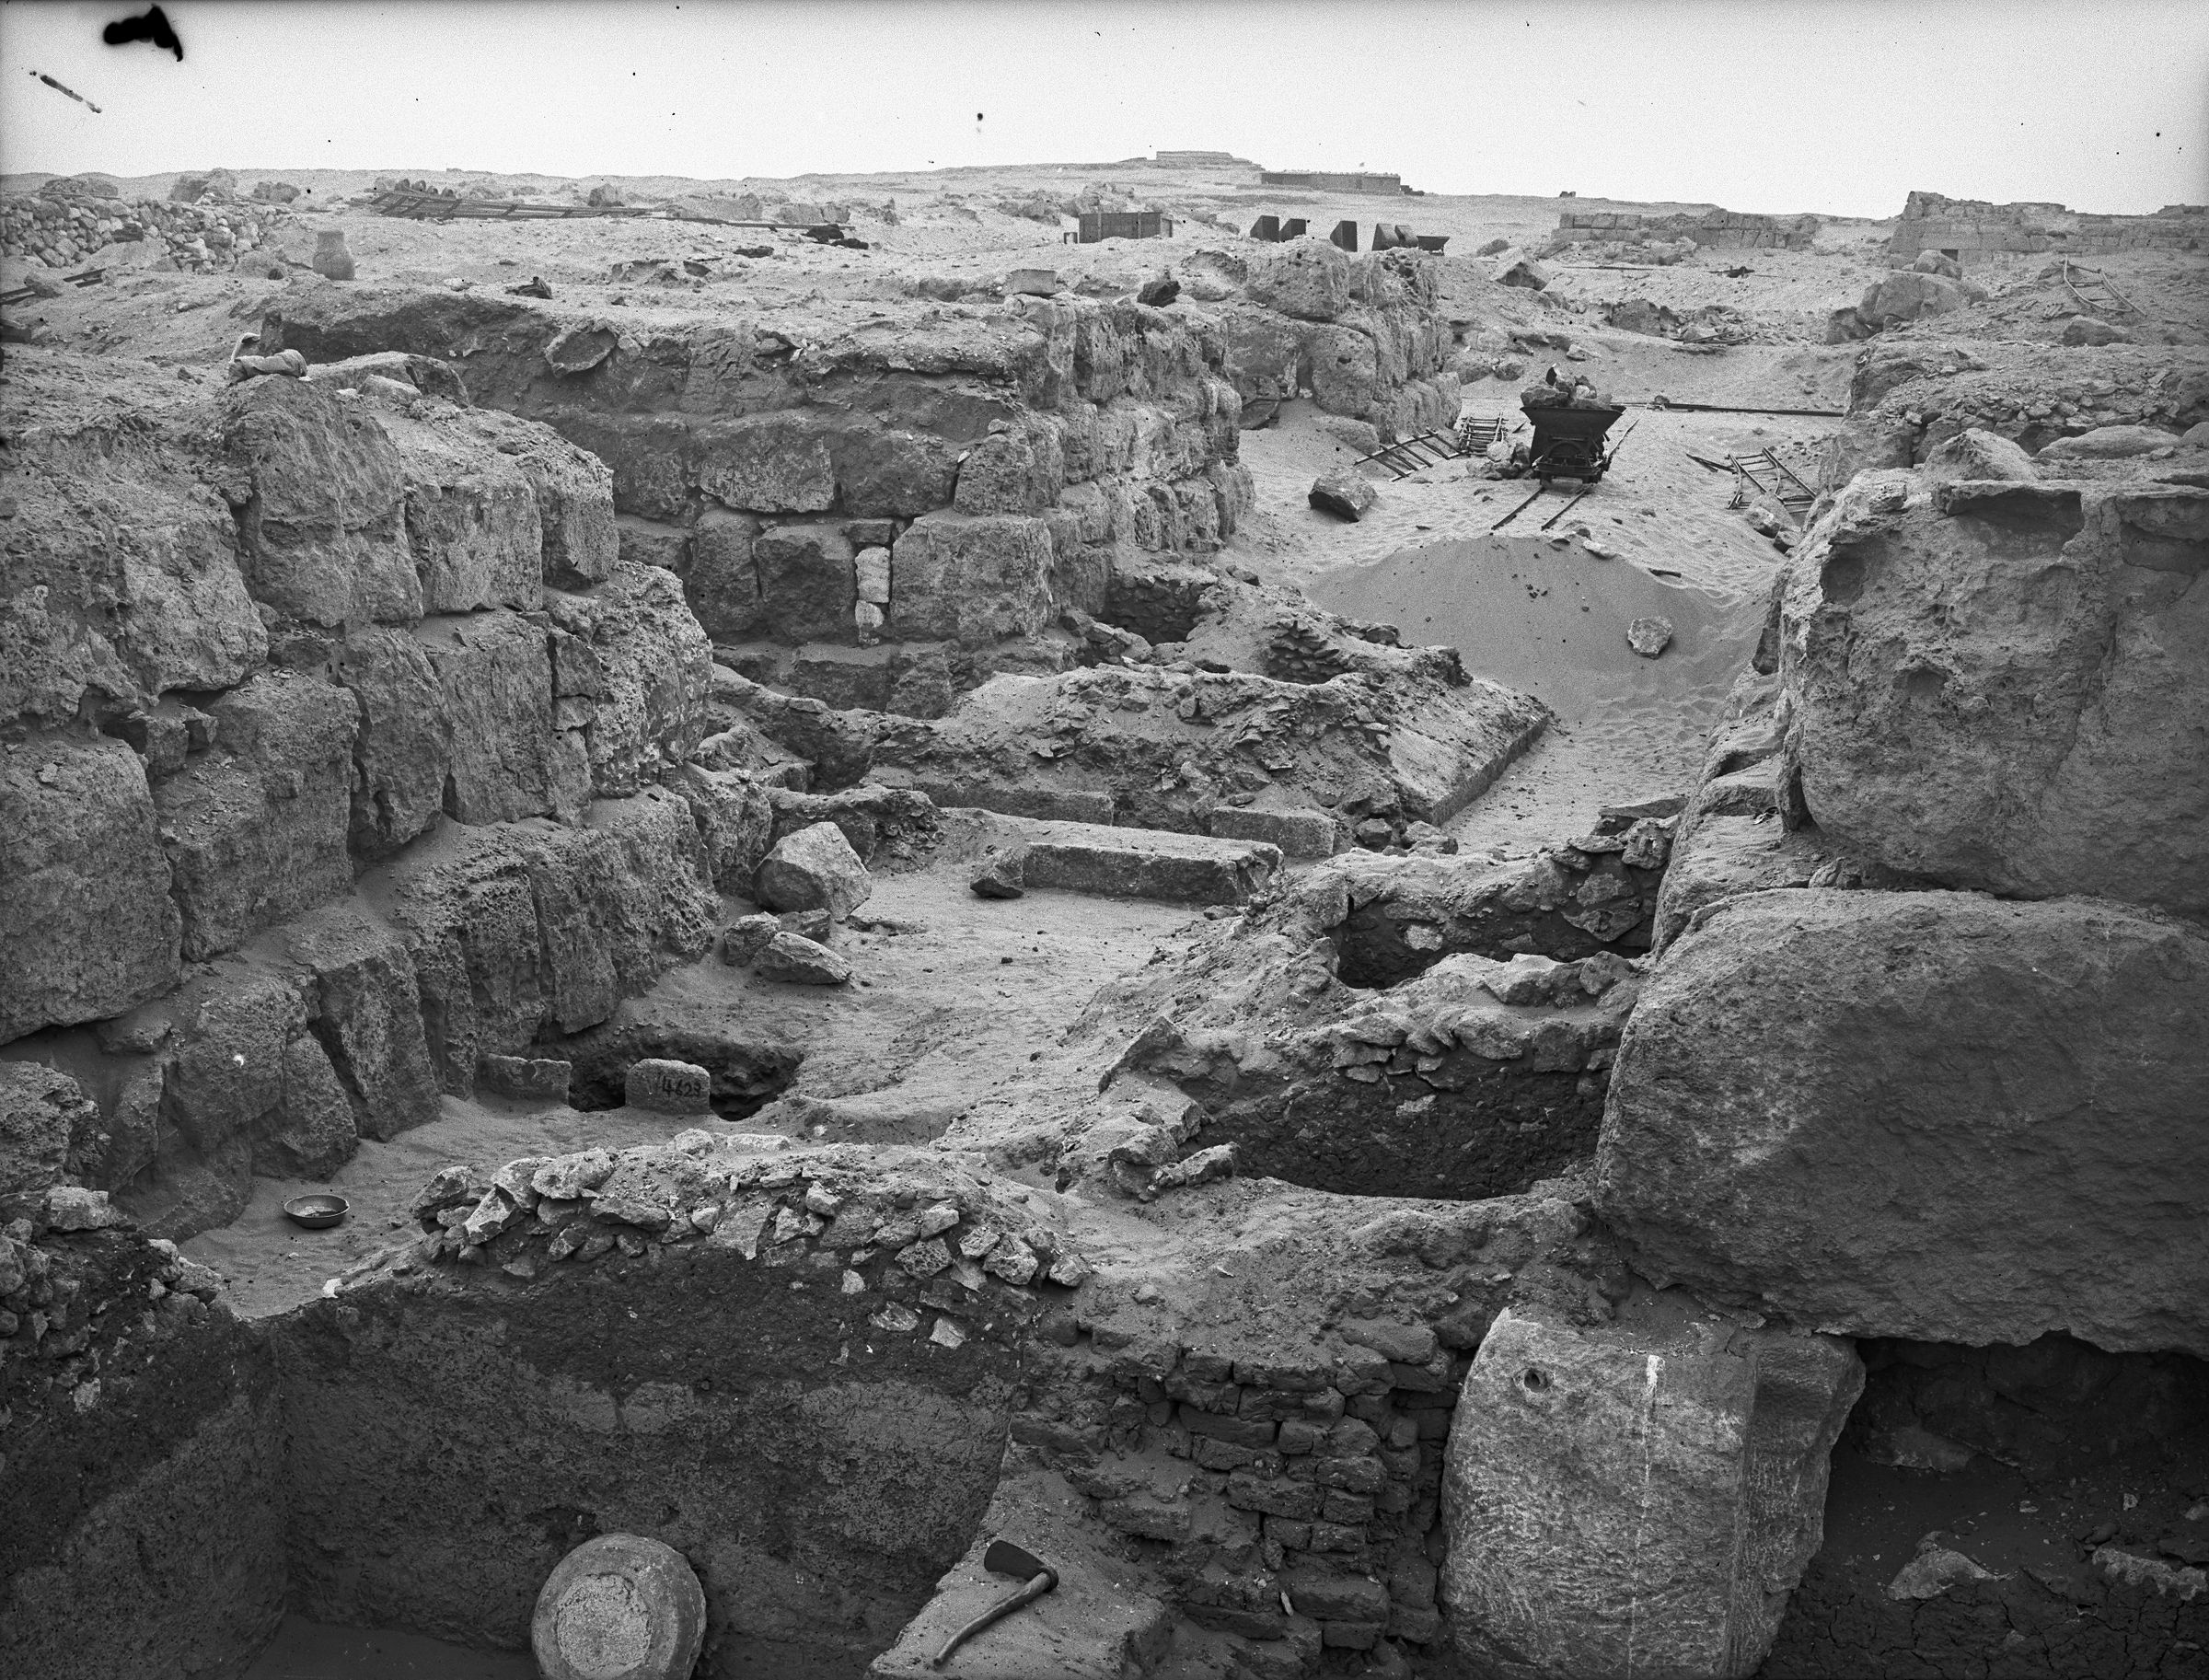 Western Cemetery: Site: Giza; View: G 4620, G 4630, G 4621, G 4623, G 4522, G 4521, G 4520